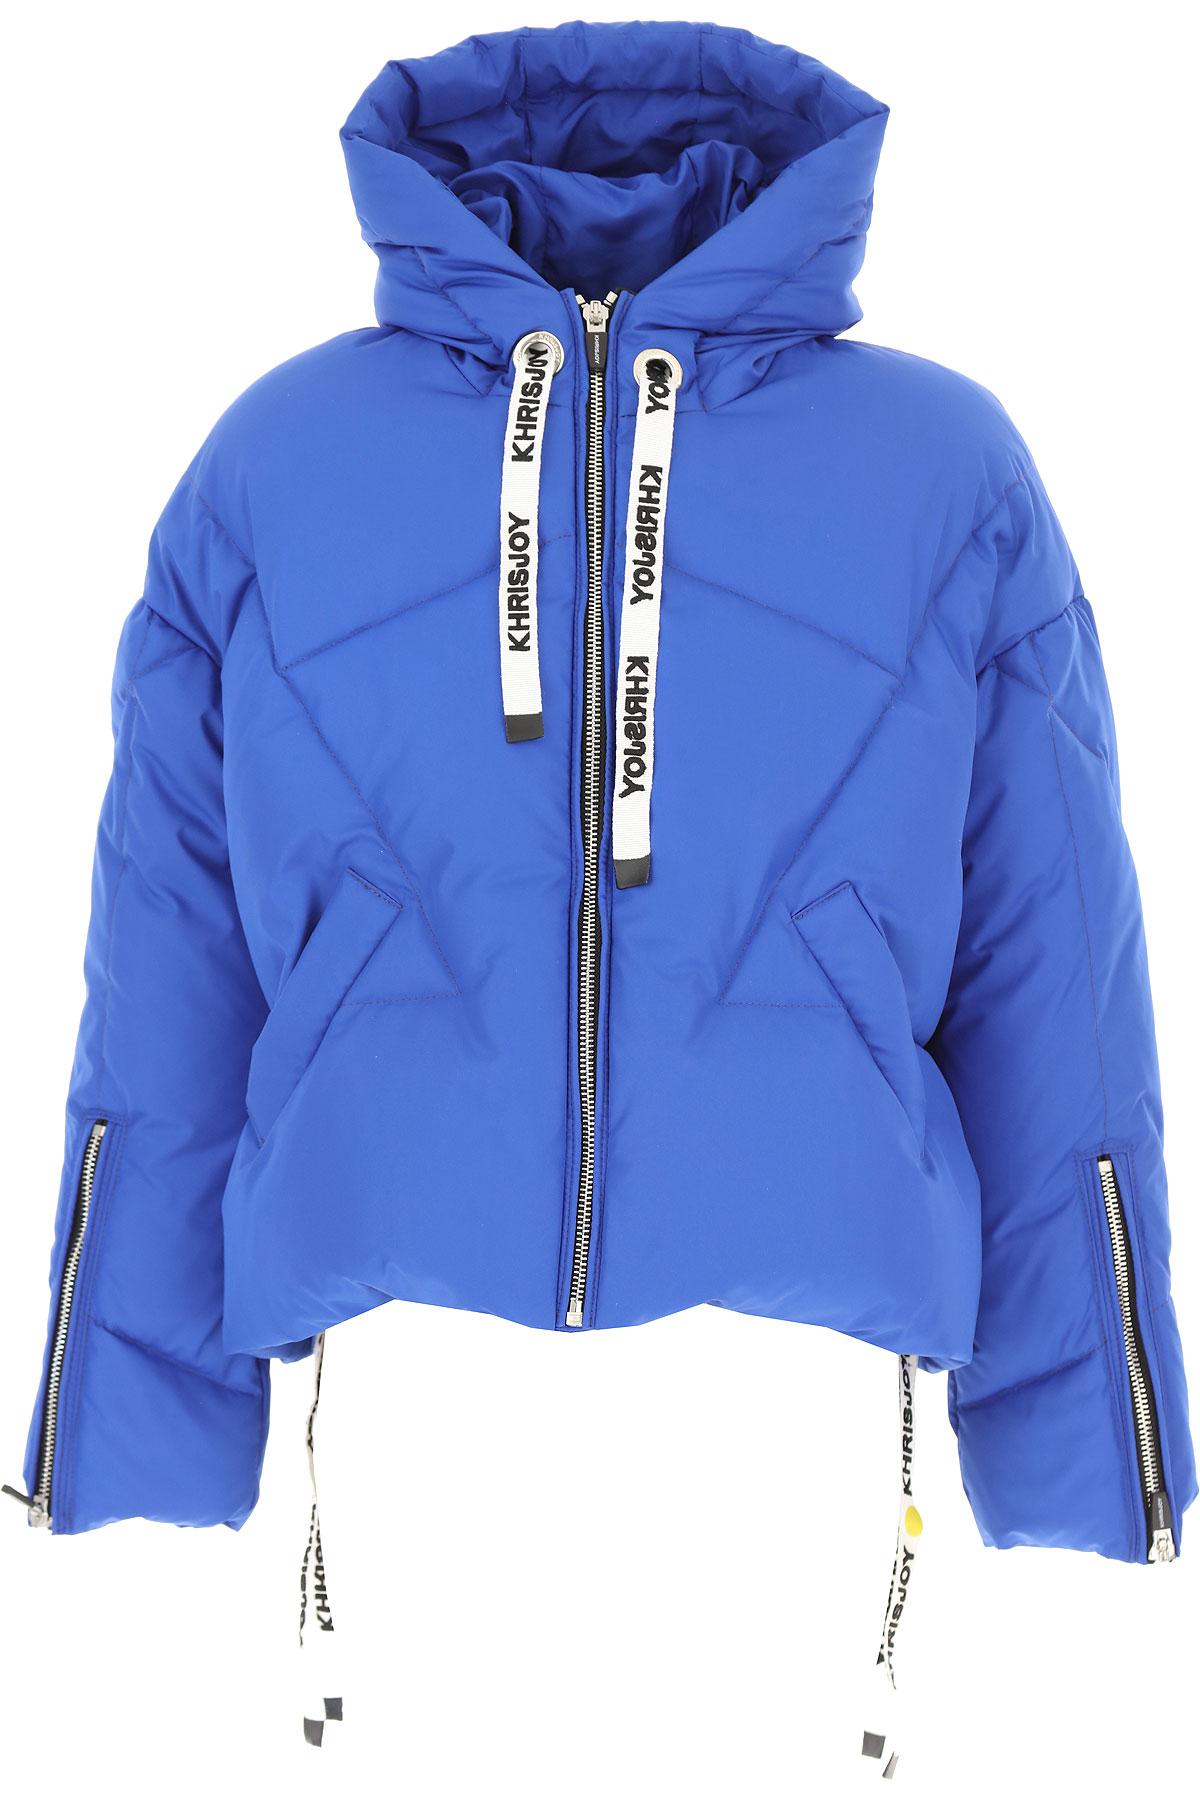 Khrisjoy Girls Down Jacket for Kids, Puffer Ski Jacket On Sale, Royal, polyamide, 2019, 4Y 6Y